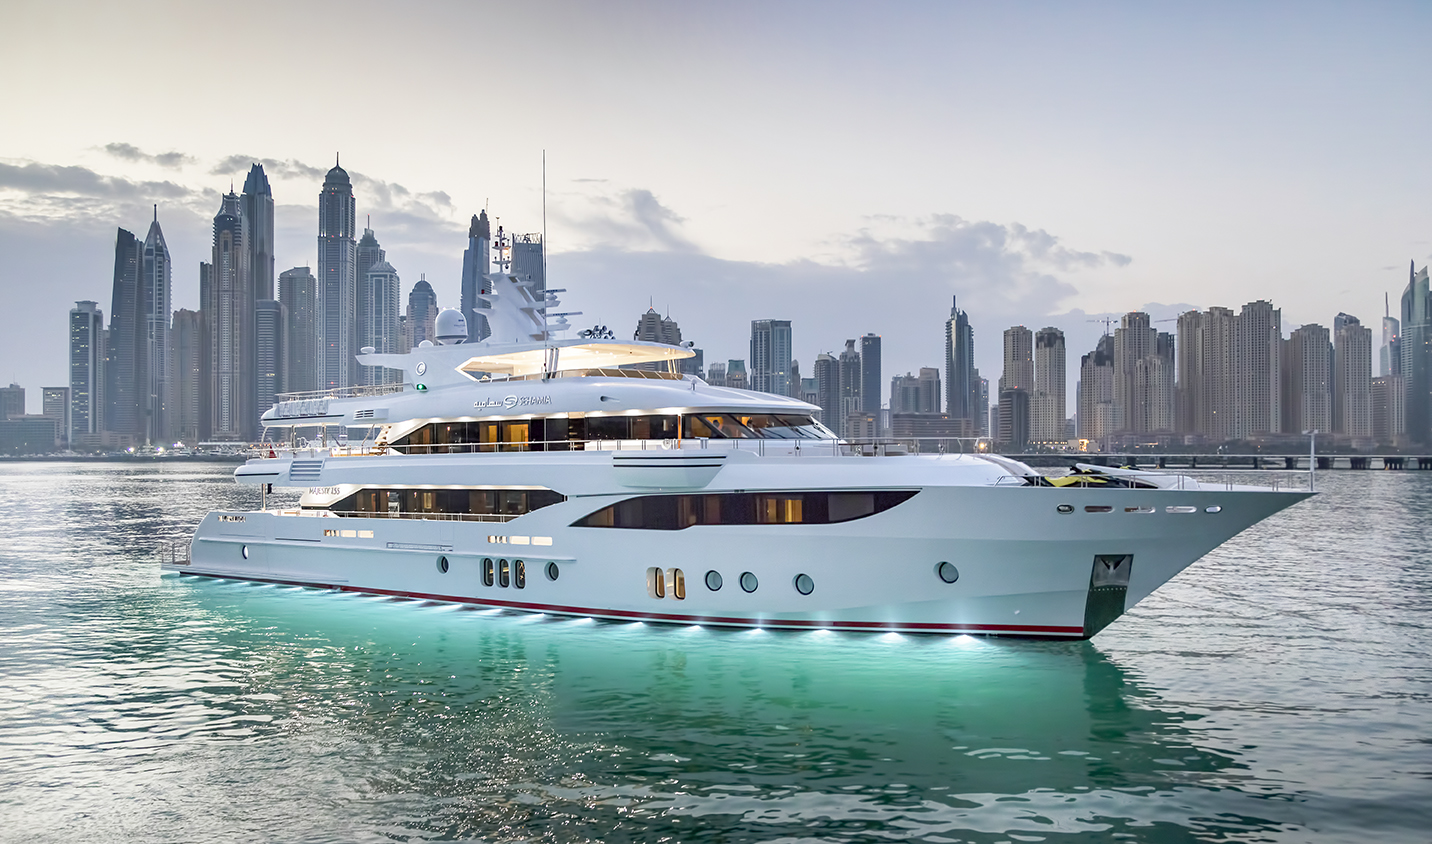 Gulf Craft Majesty 155 superyacht